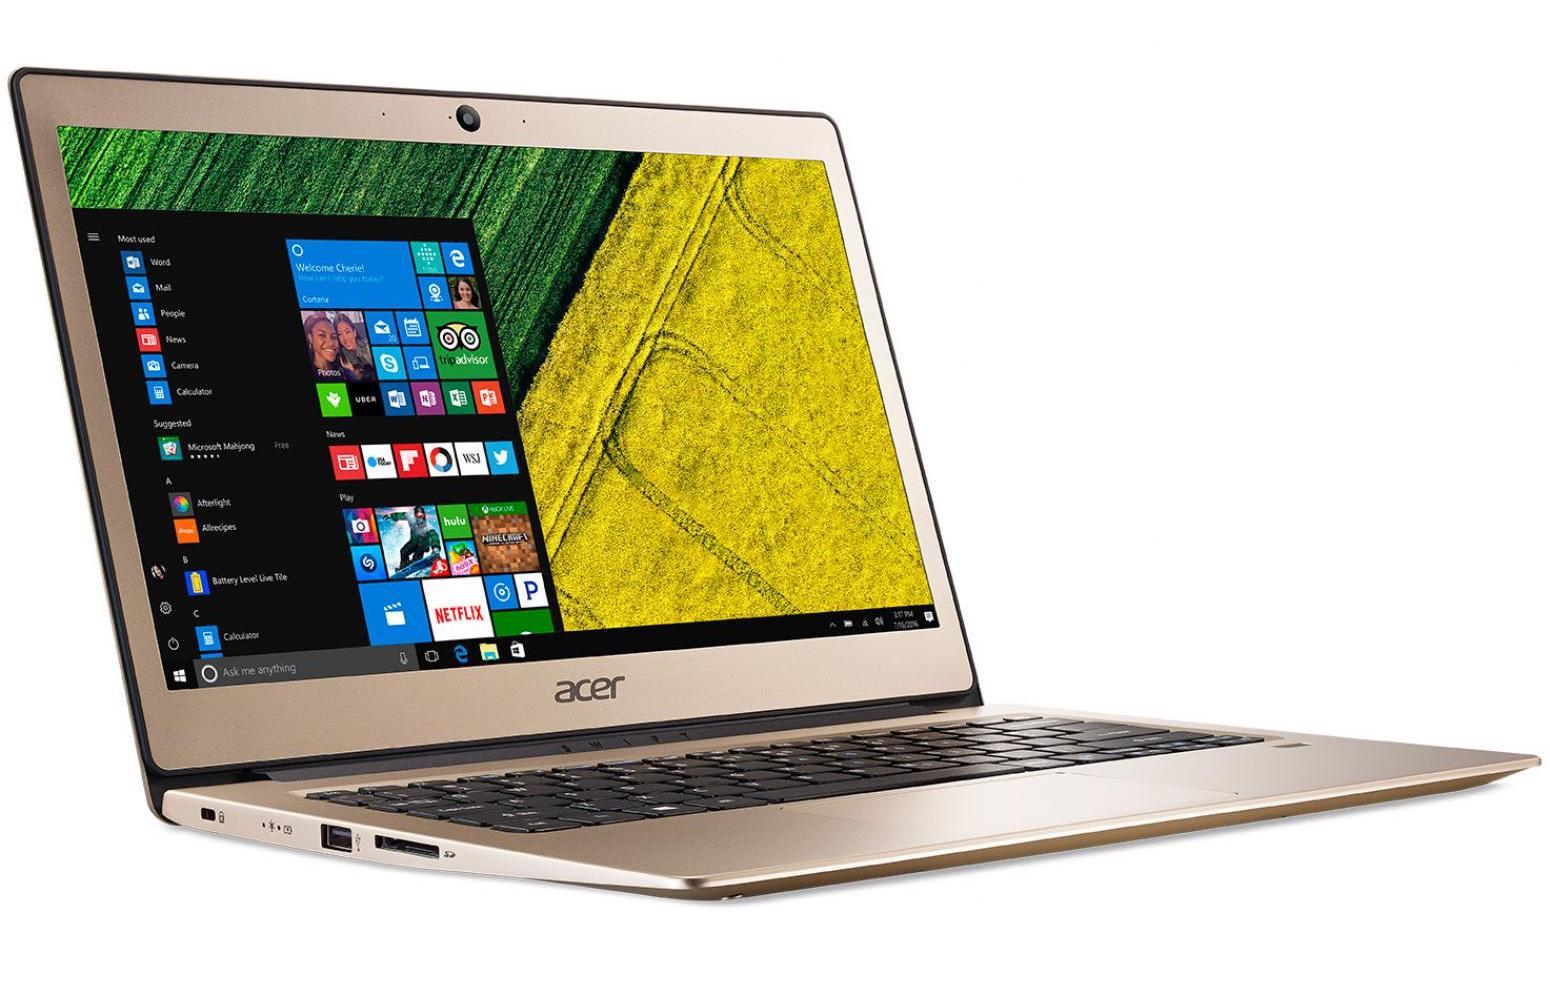 Acer Swift SF113-31-P14U, ultrabook 13 pouces fin Or Full IPS SSD (338€)